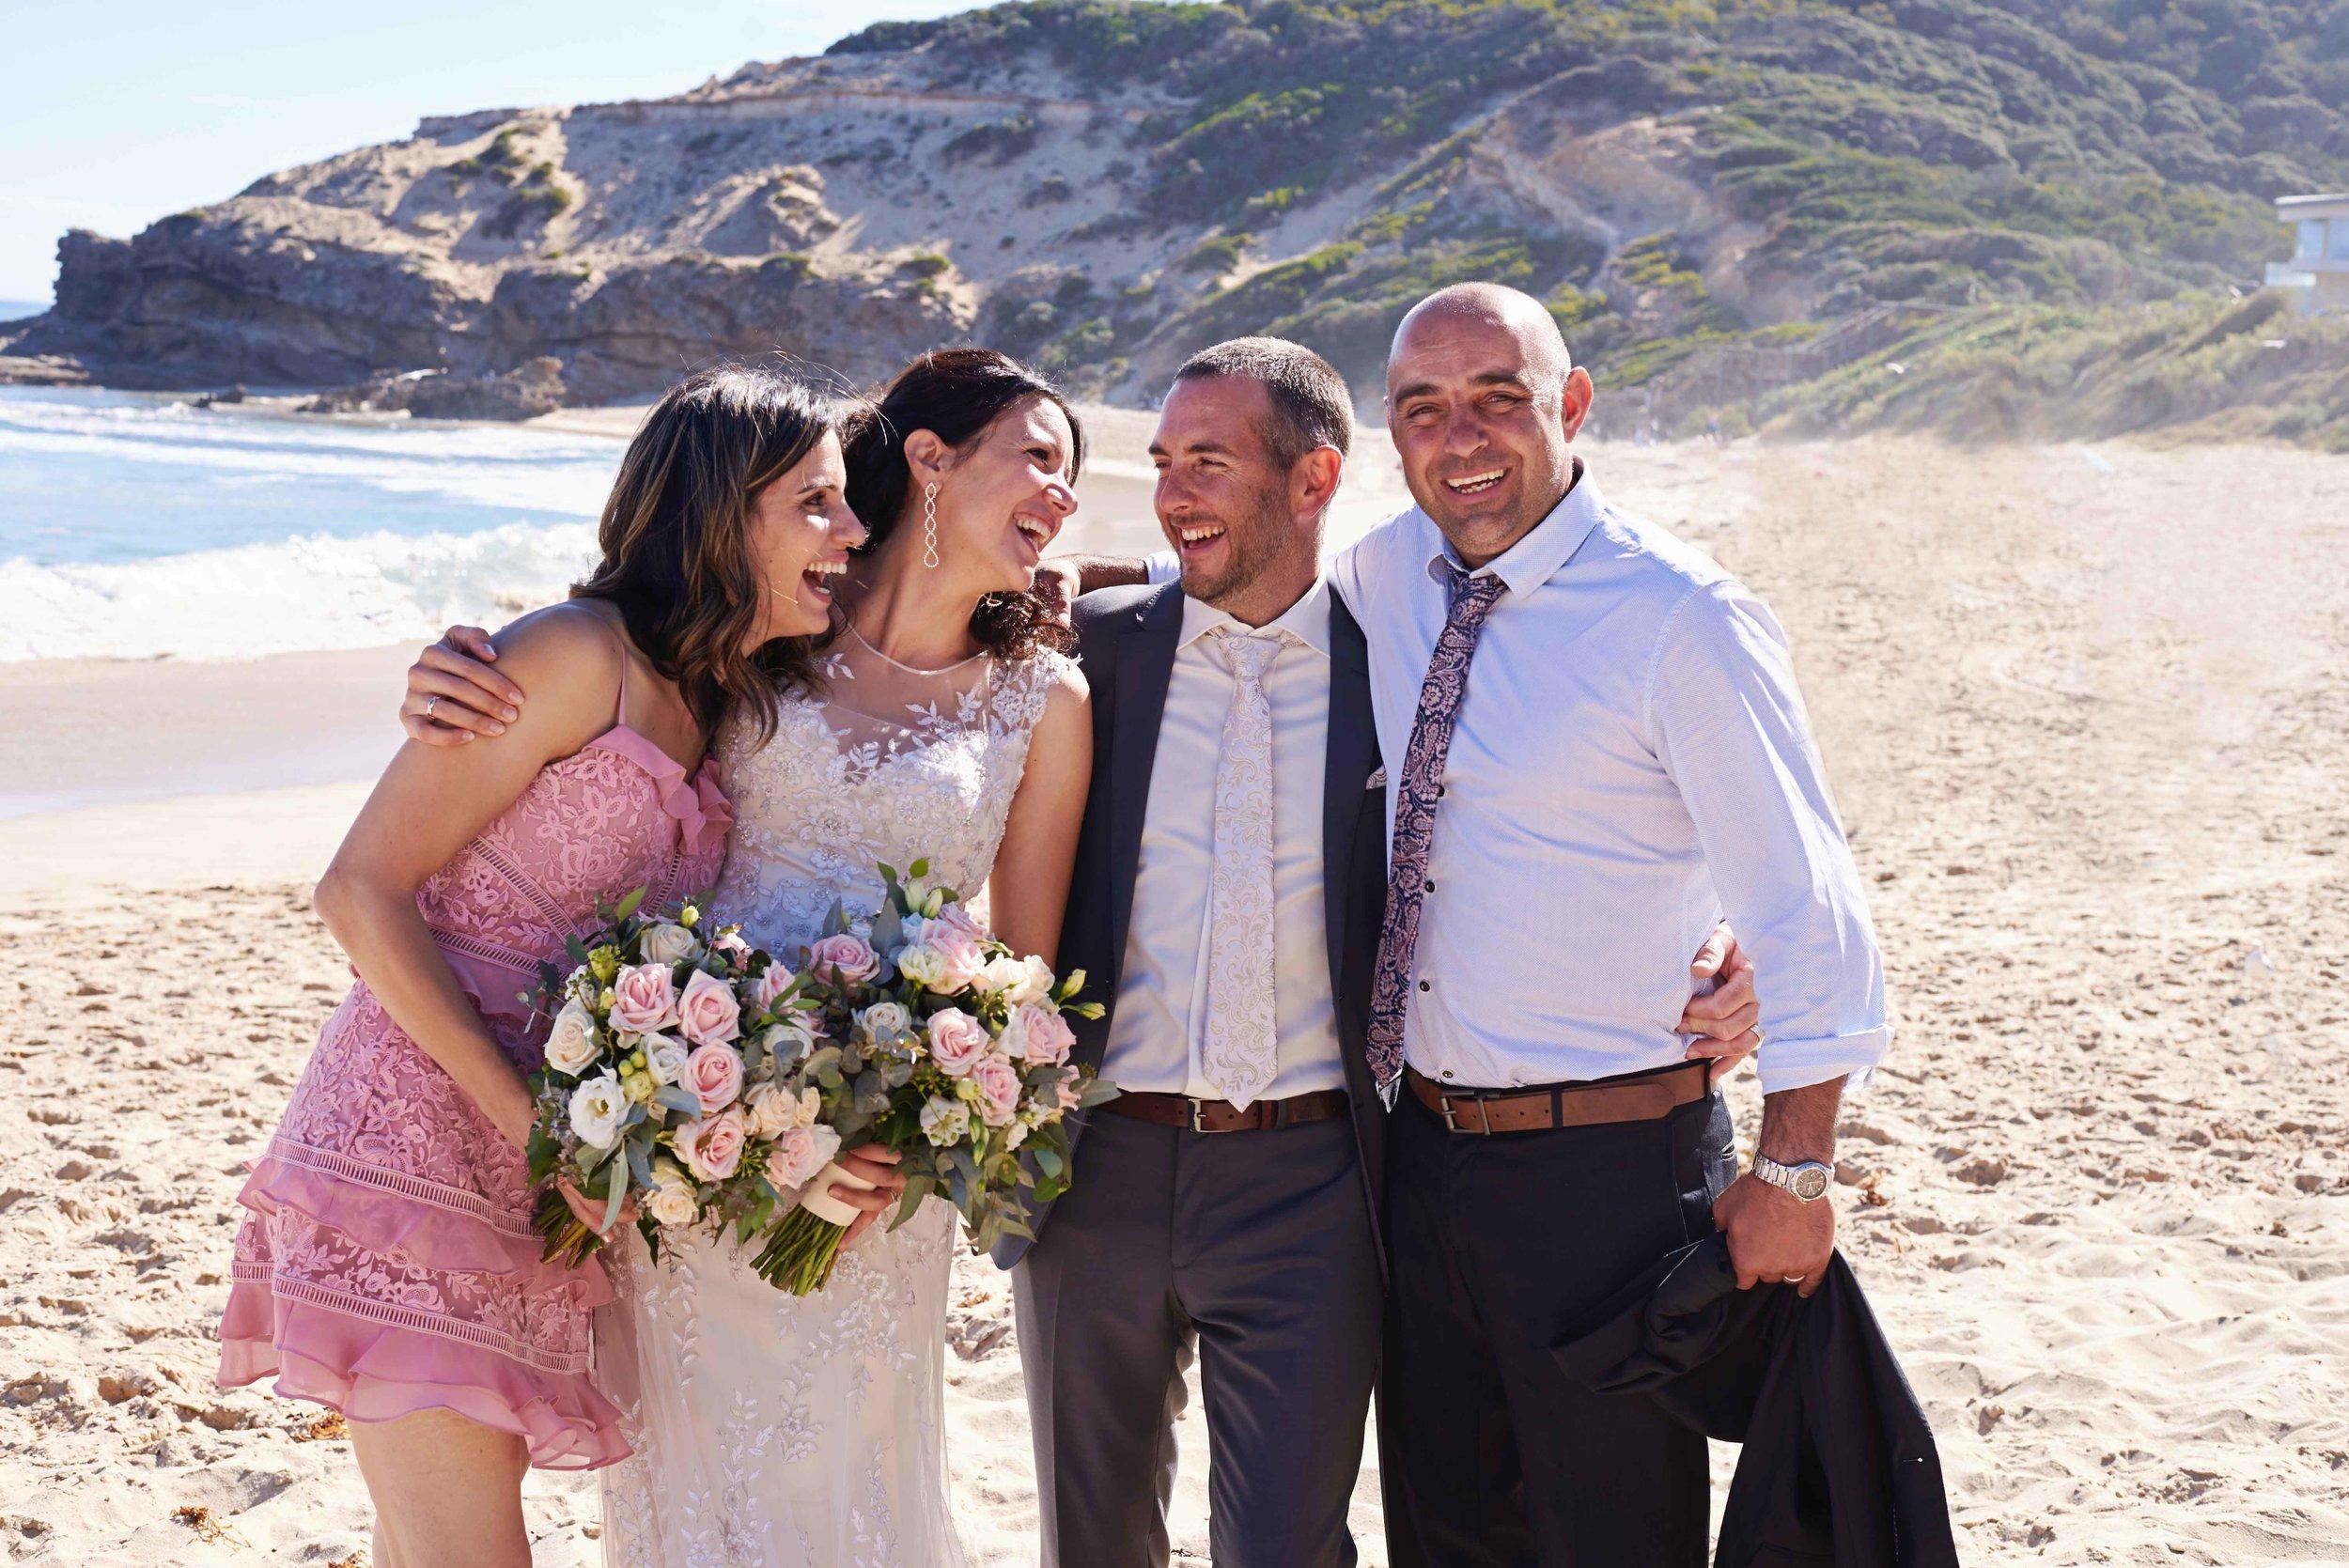 sorrento-wedding-photography-all-smiles-marissa-jade-photography-122.jpg